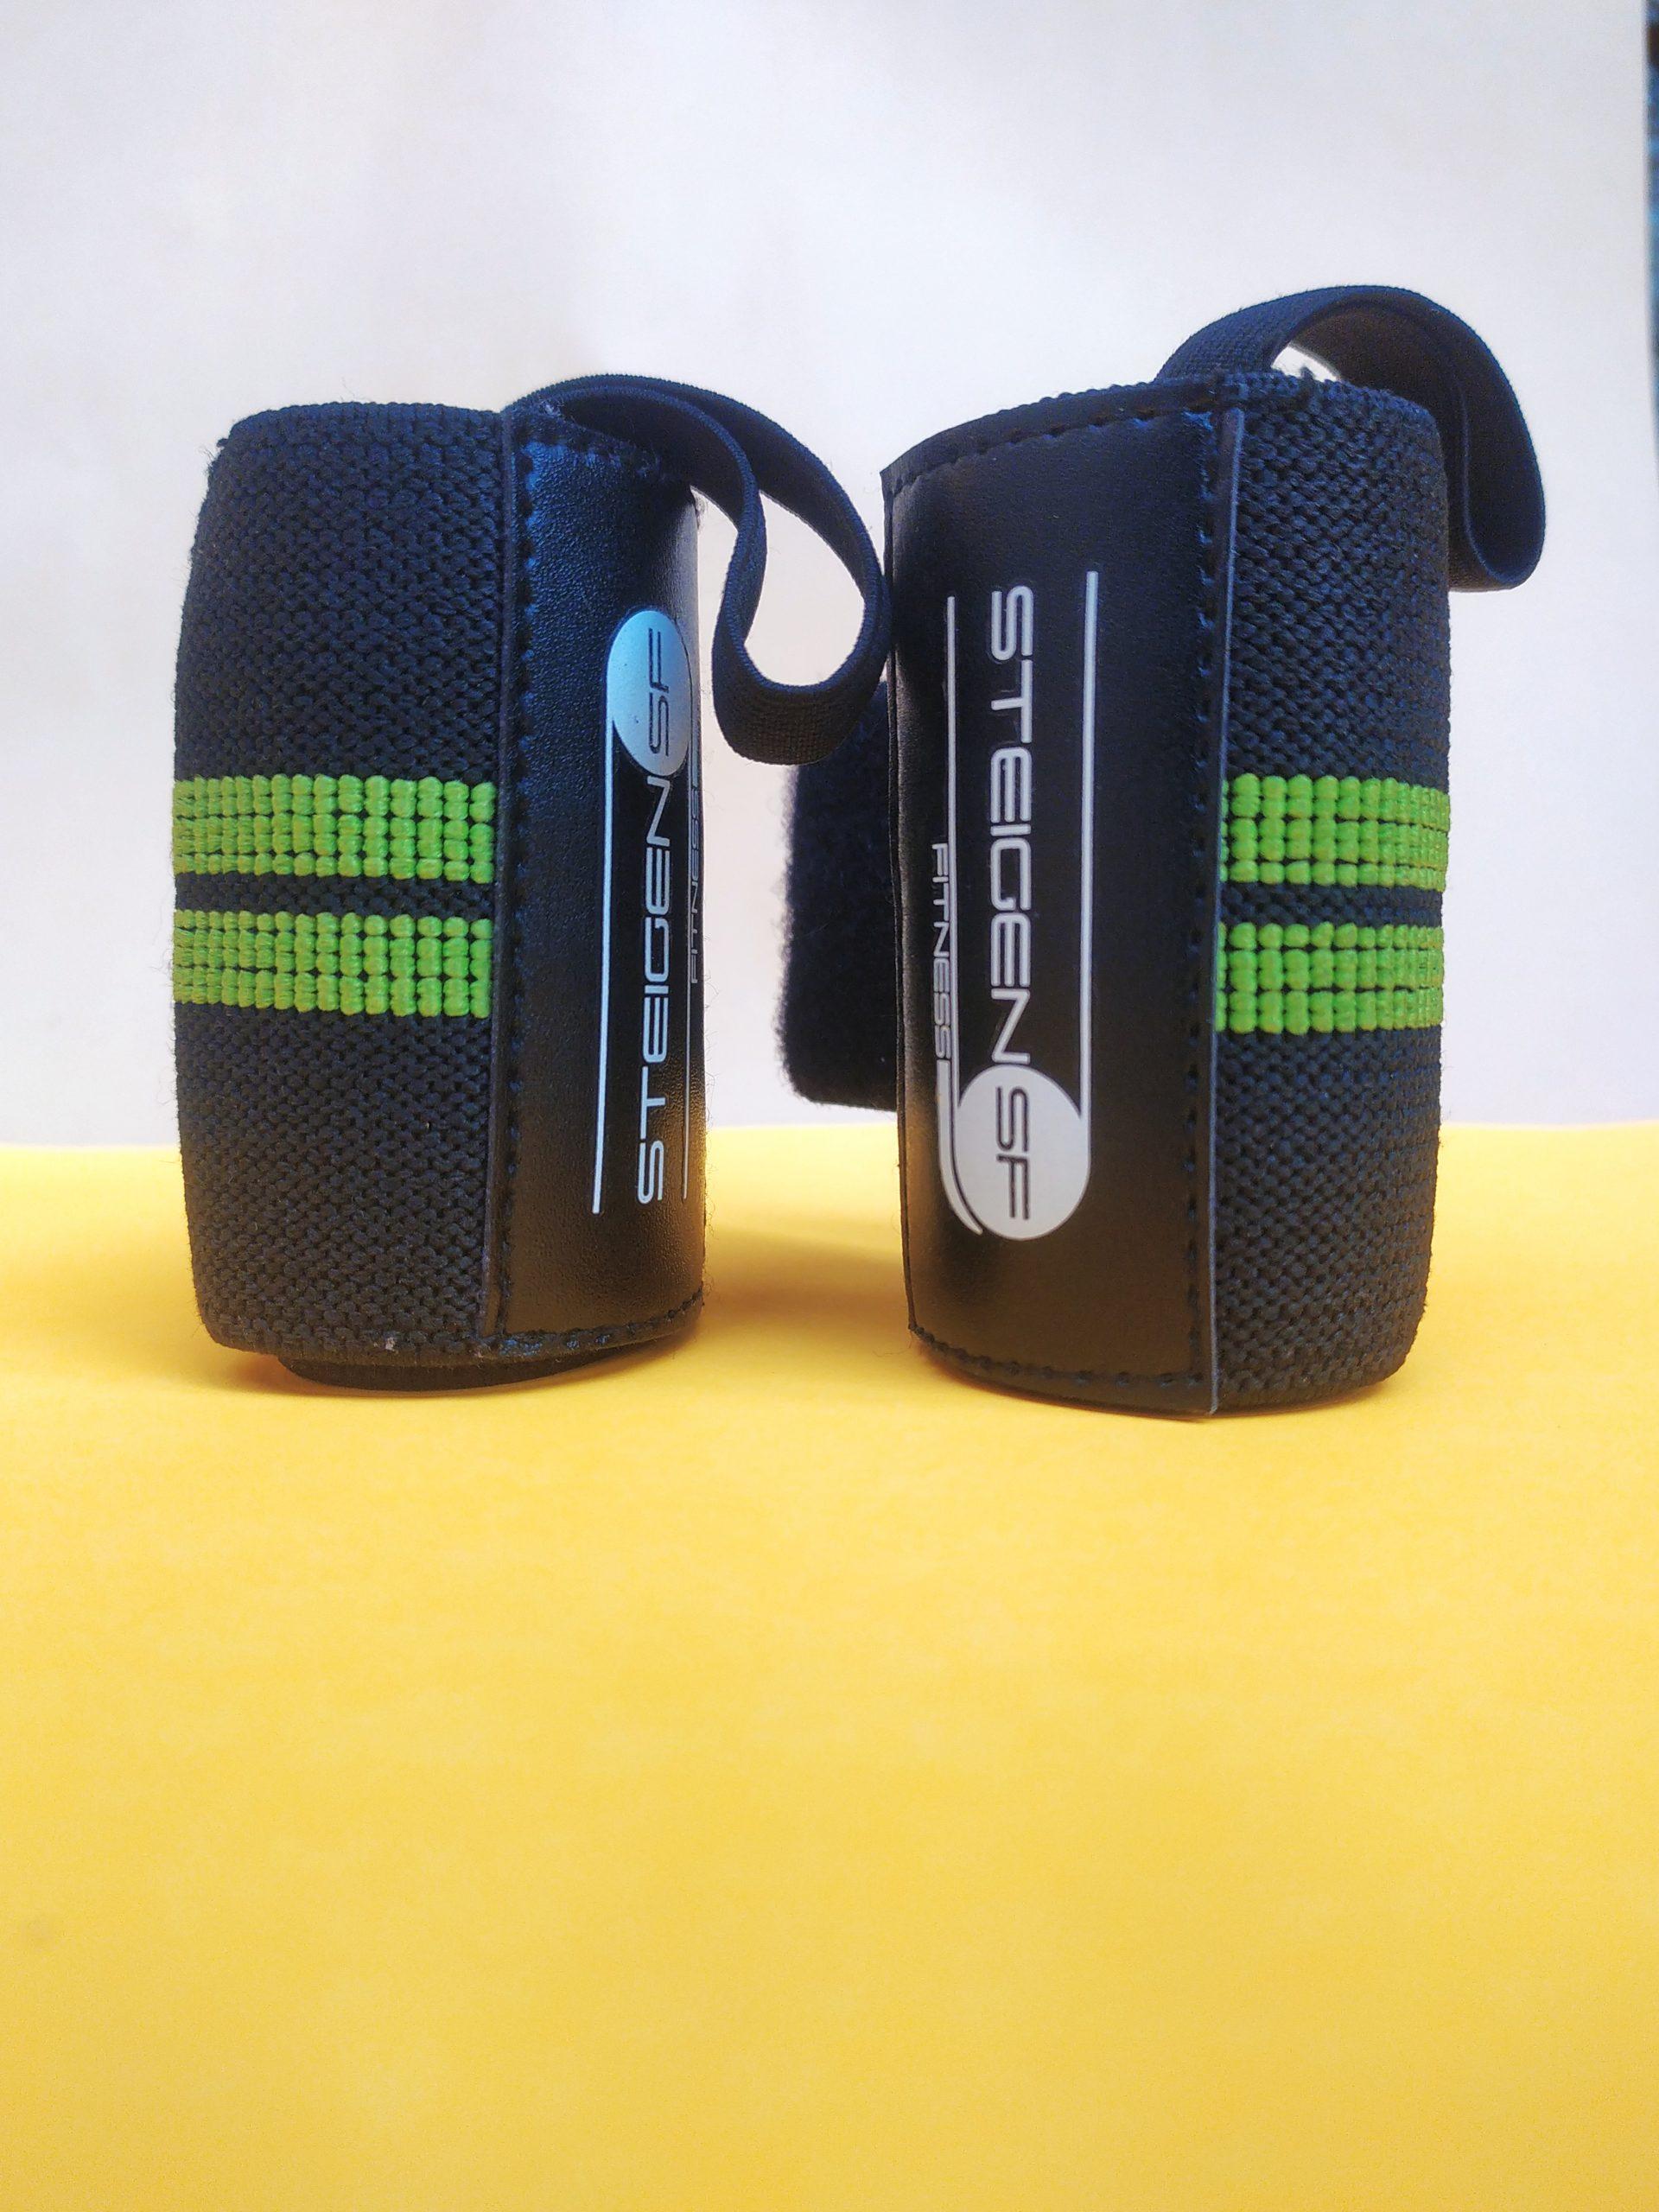 Wrist support belts